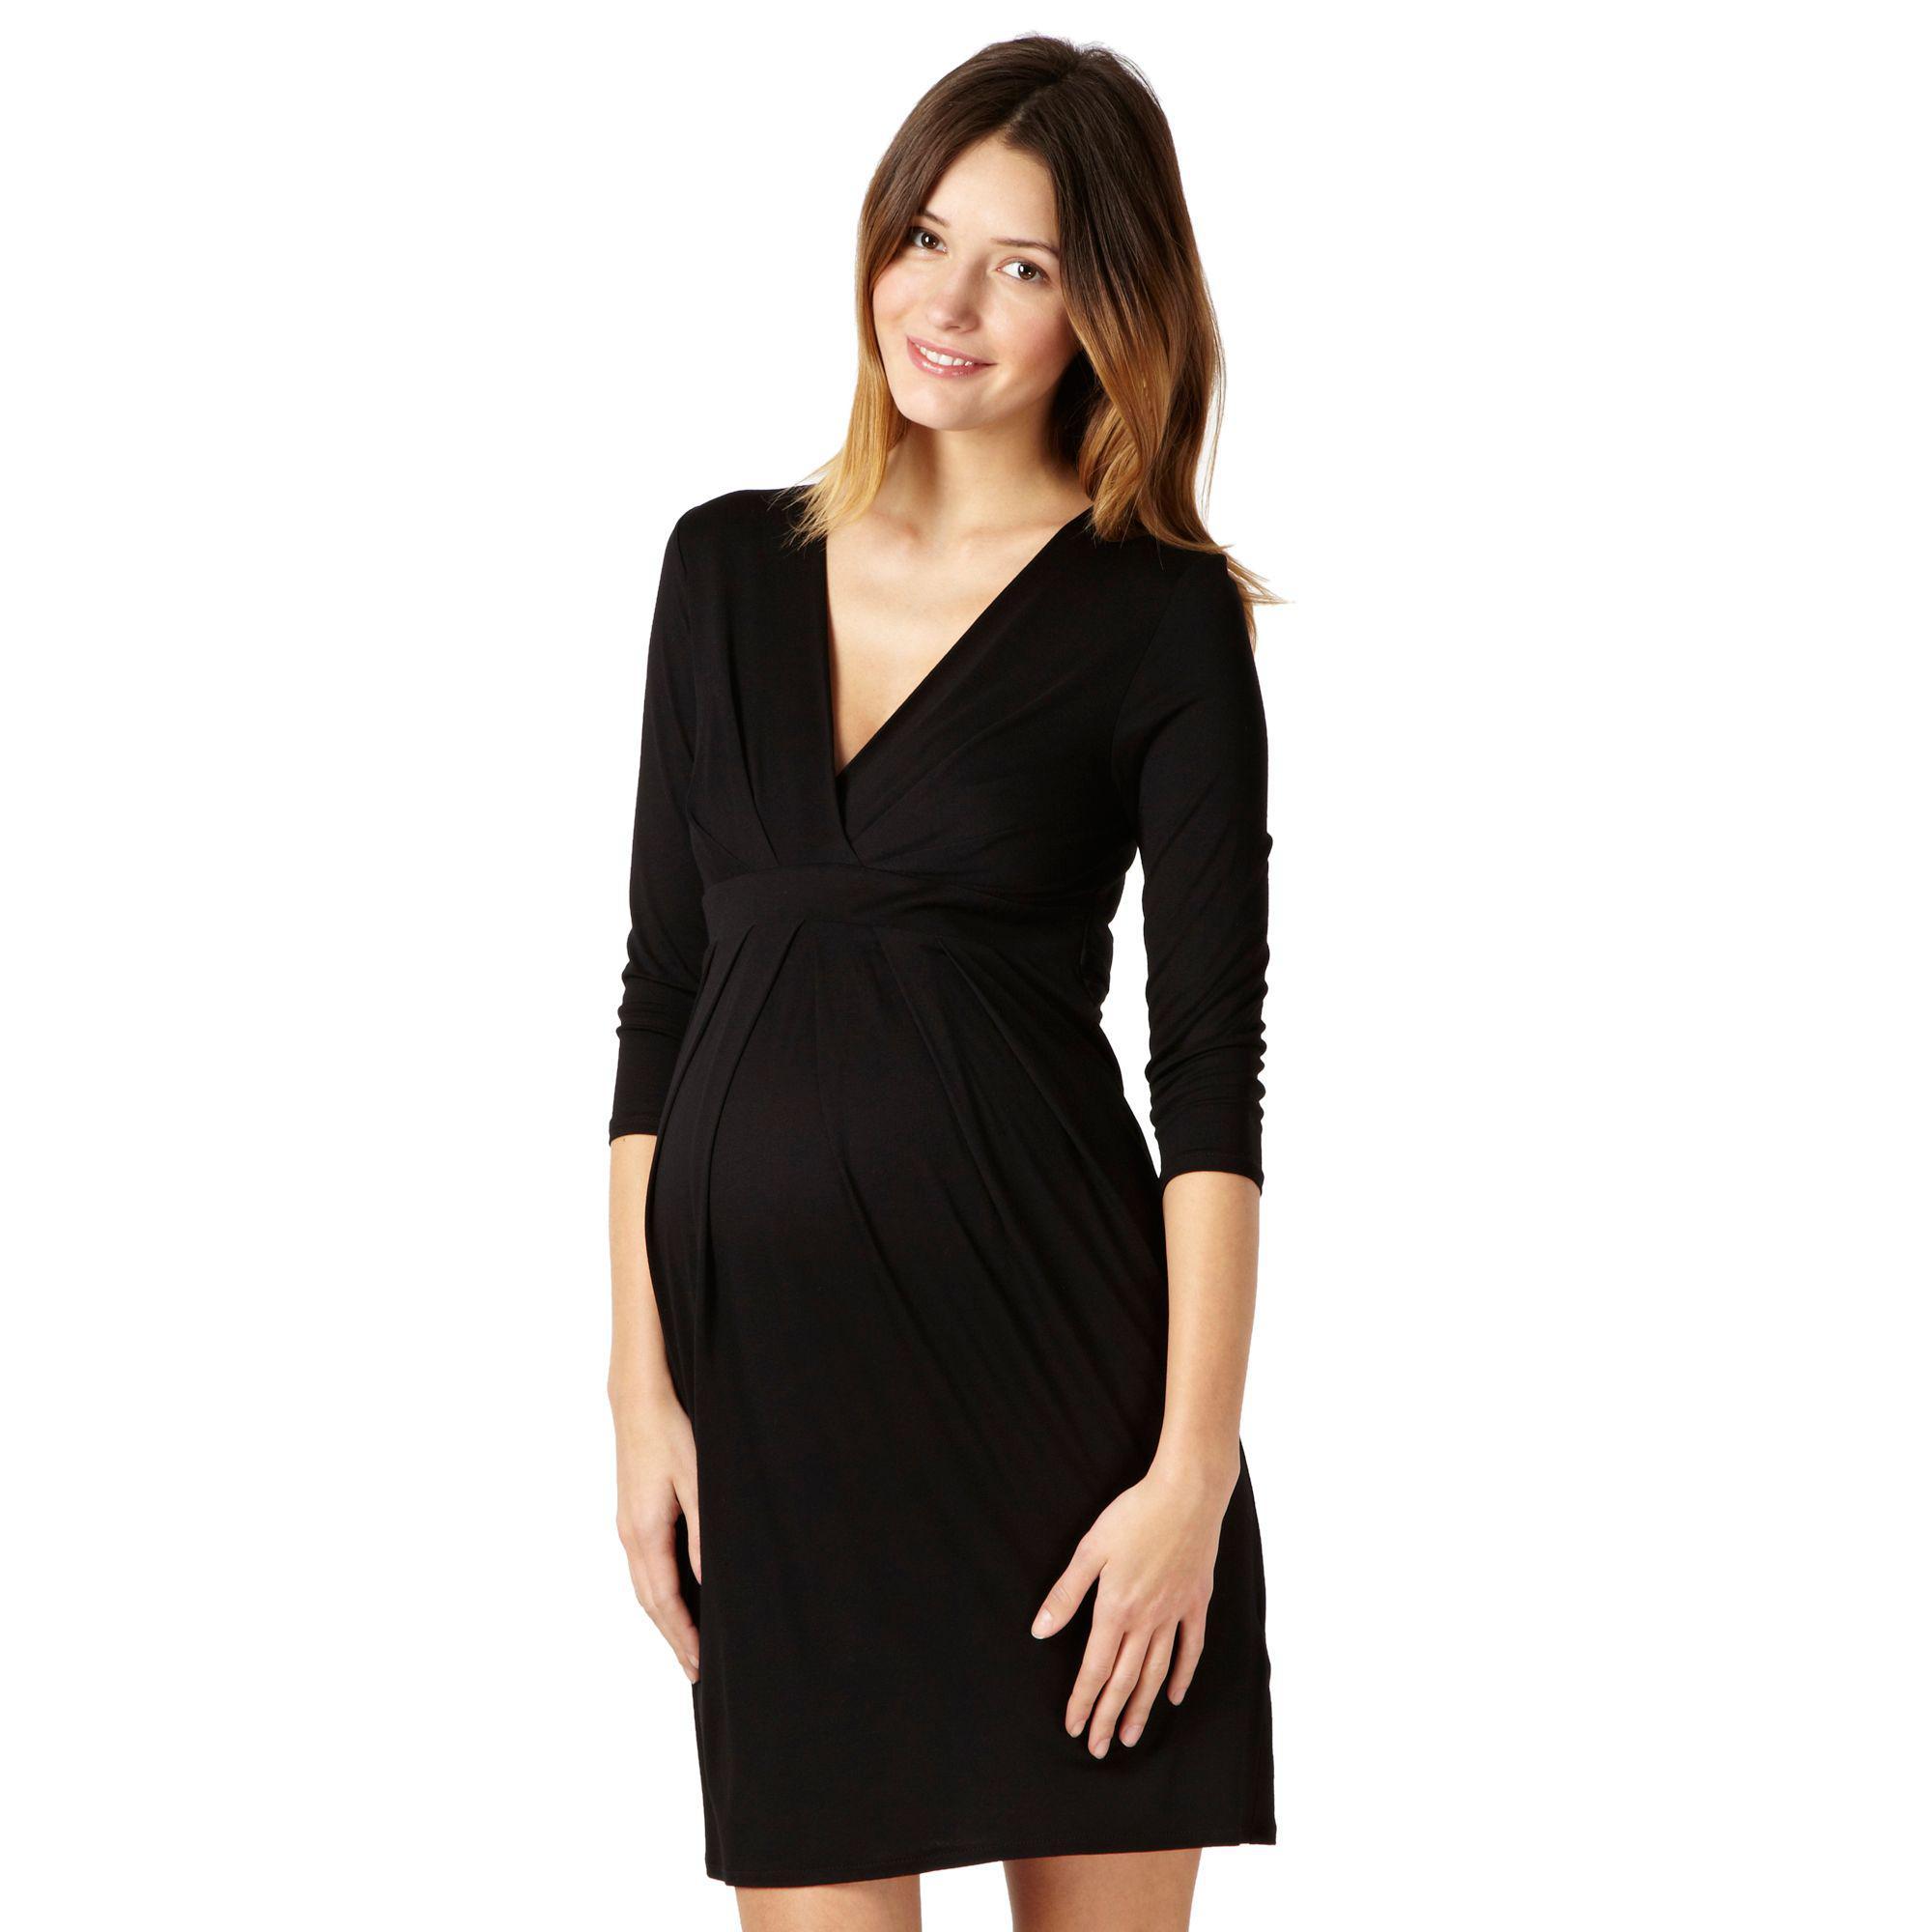 70f95391c10fb Red Herring Black Jersey Tie Back Maternity Dress in Black - Lyst